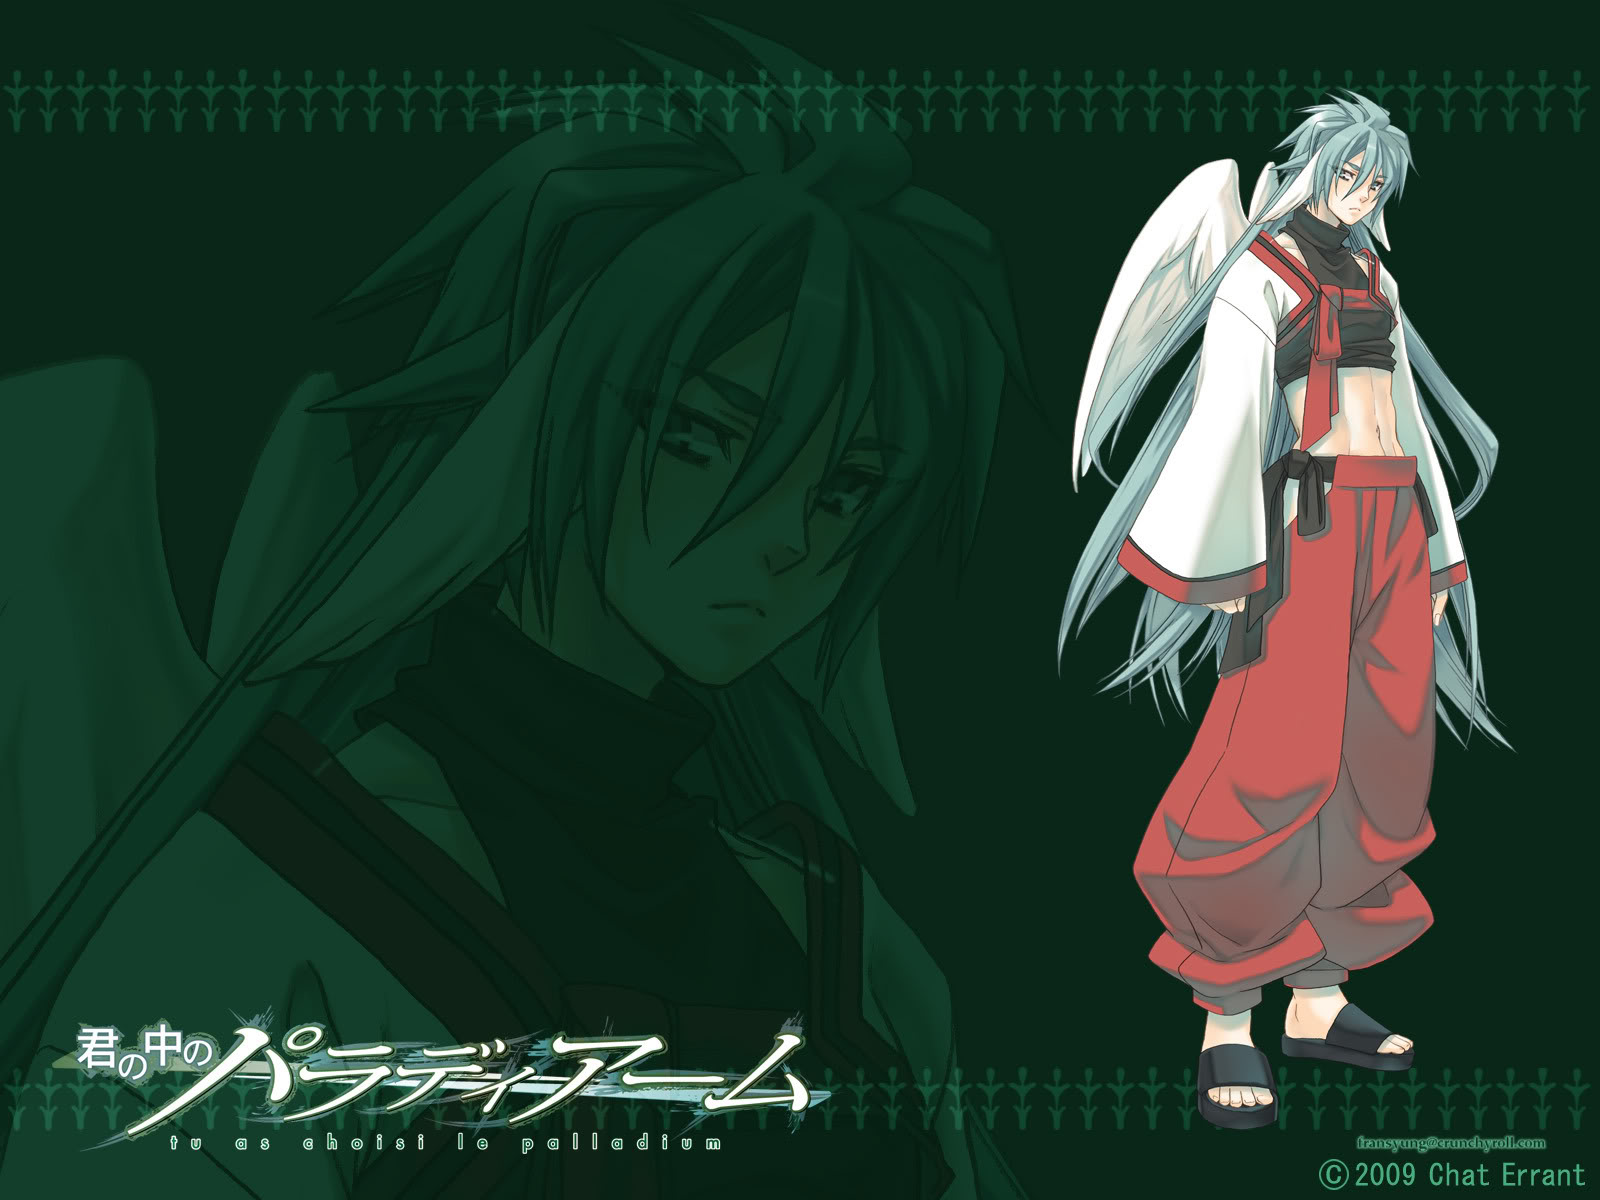 dobra obsługa styl mody na stopach o Kimi No Naka No Palladium Wallpaper #177174 - Zerochan Anime ...